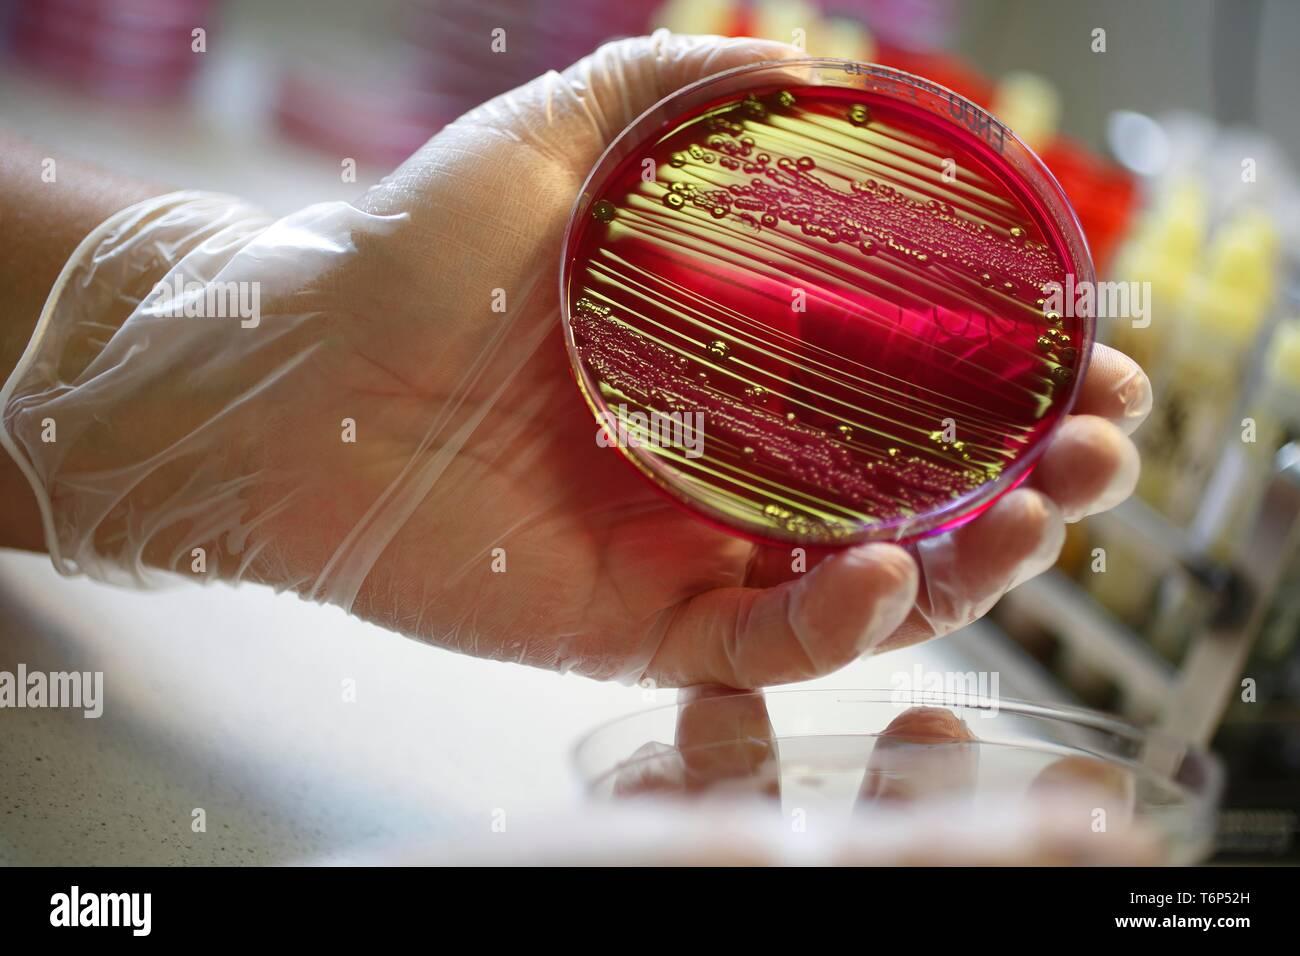 Petrischale mit Nährmedium mit bakteriellen Kulturen, medizinisches Labor, Karlovy Vary, Tschechische Republik Stockbild